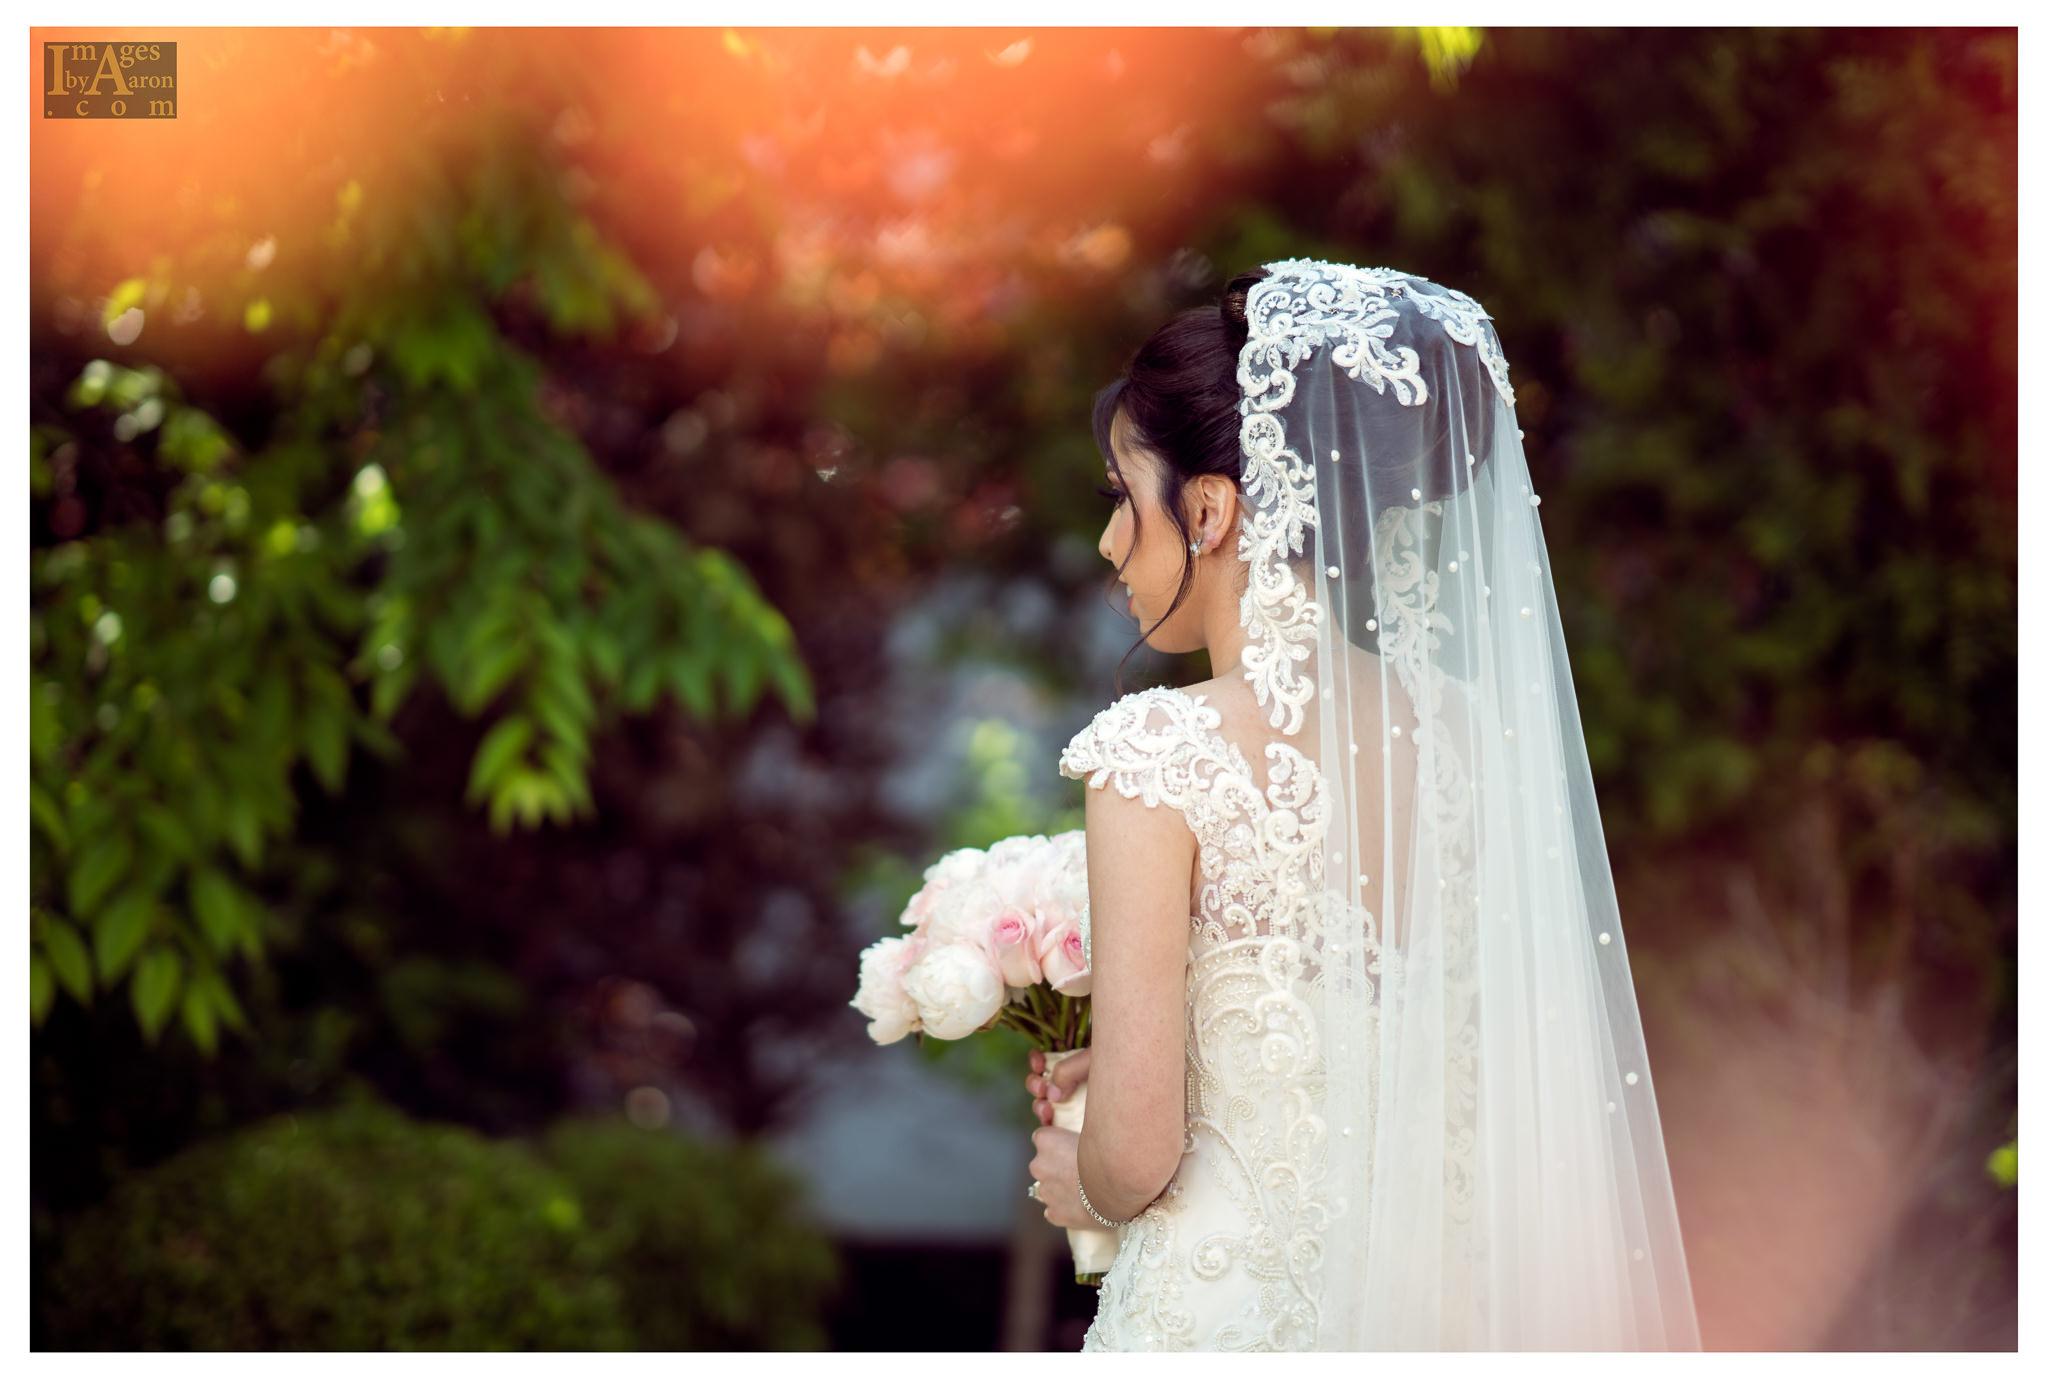 Gokce Turkish Wedding First Look New York Photographer Wedding Photography The Royal Manor-1.jpg